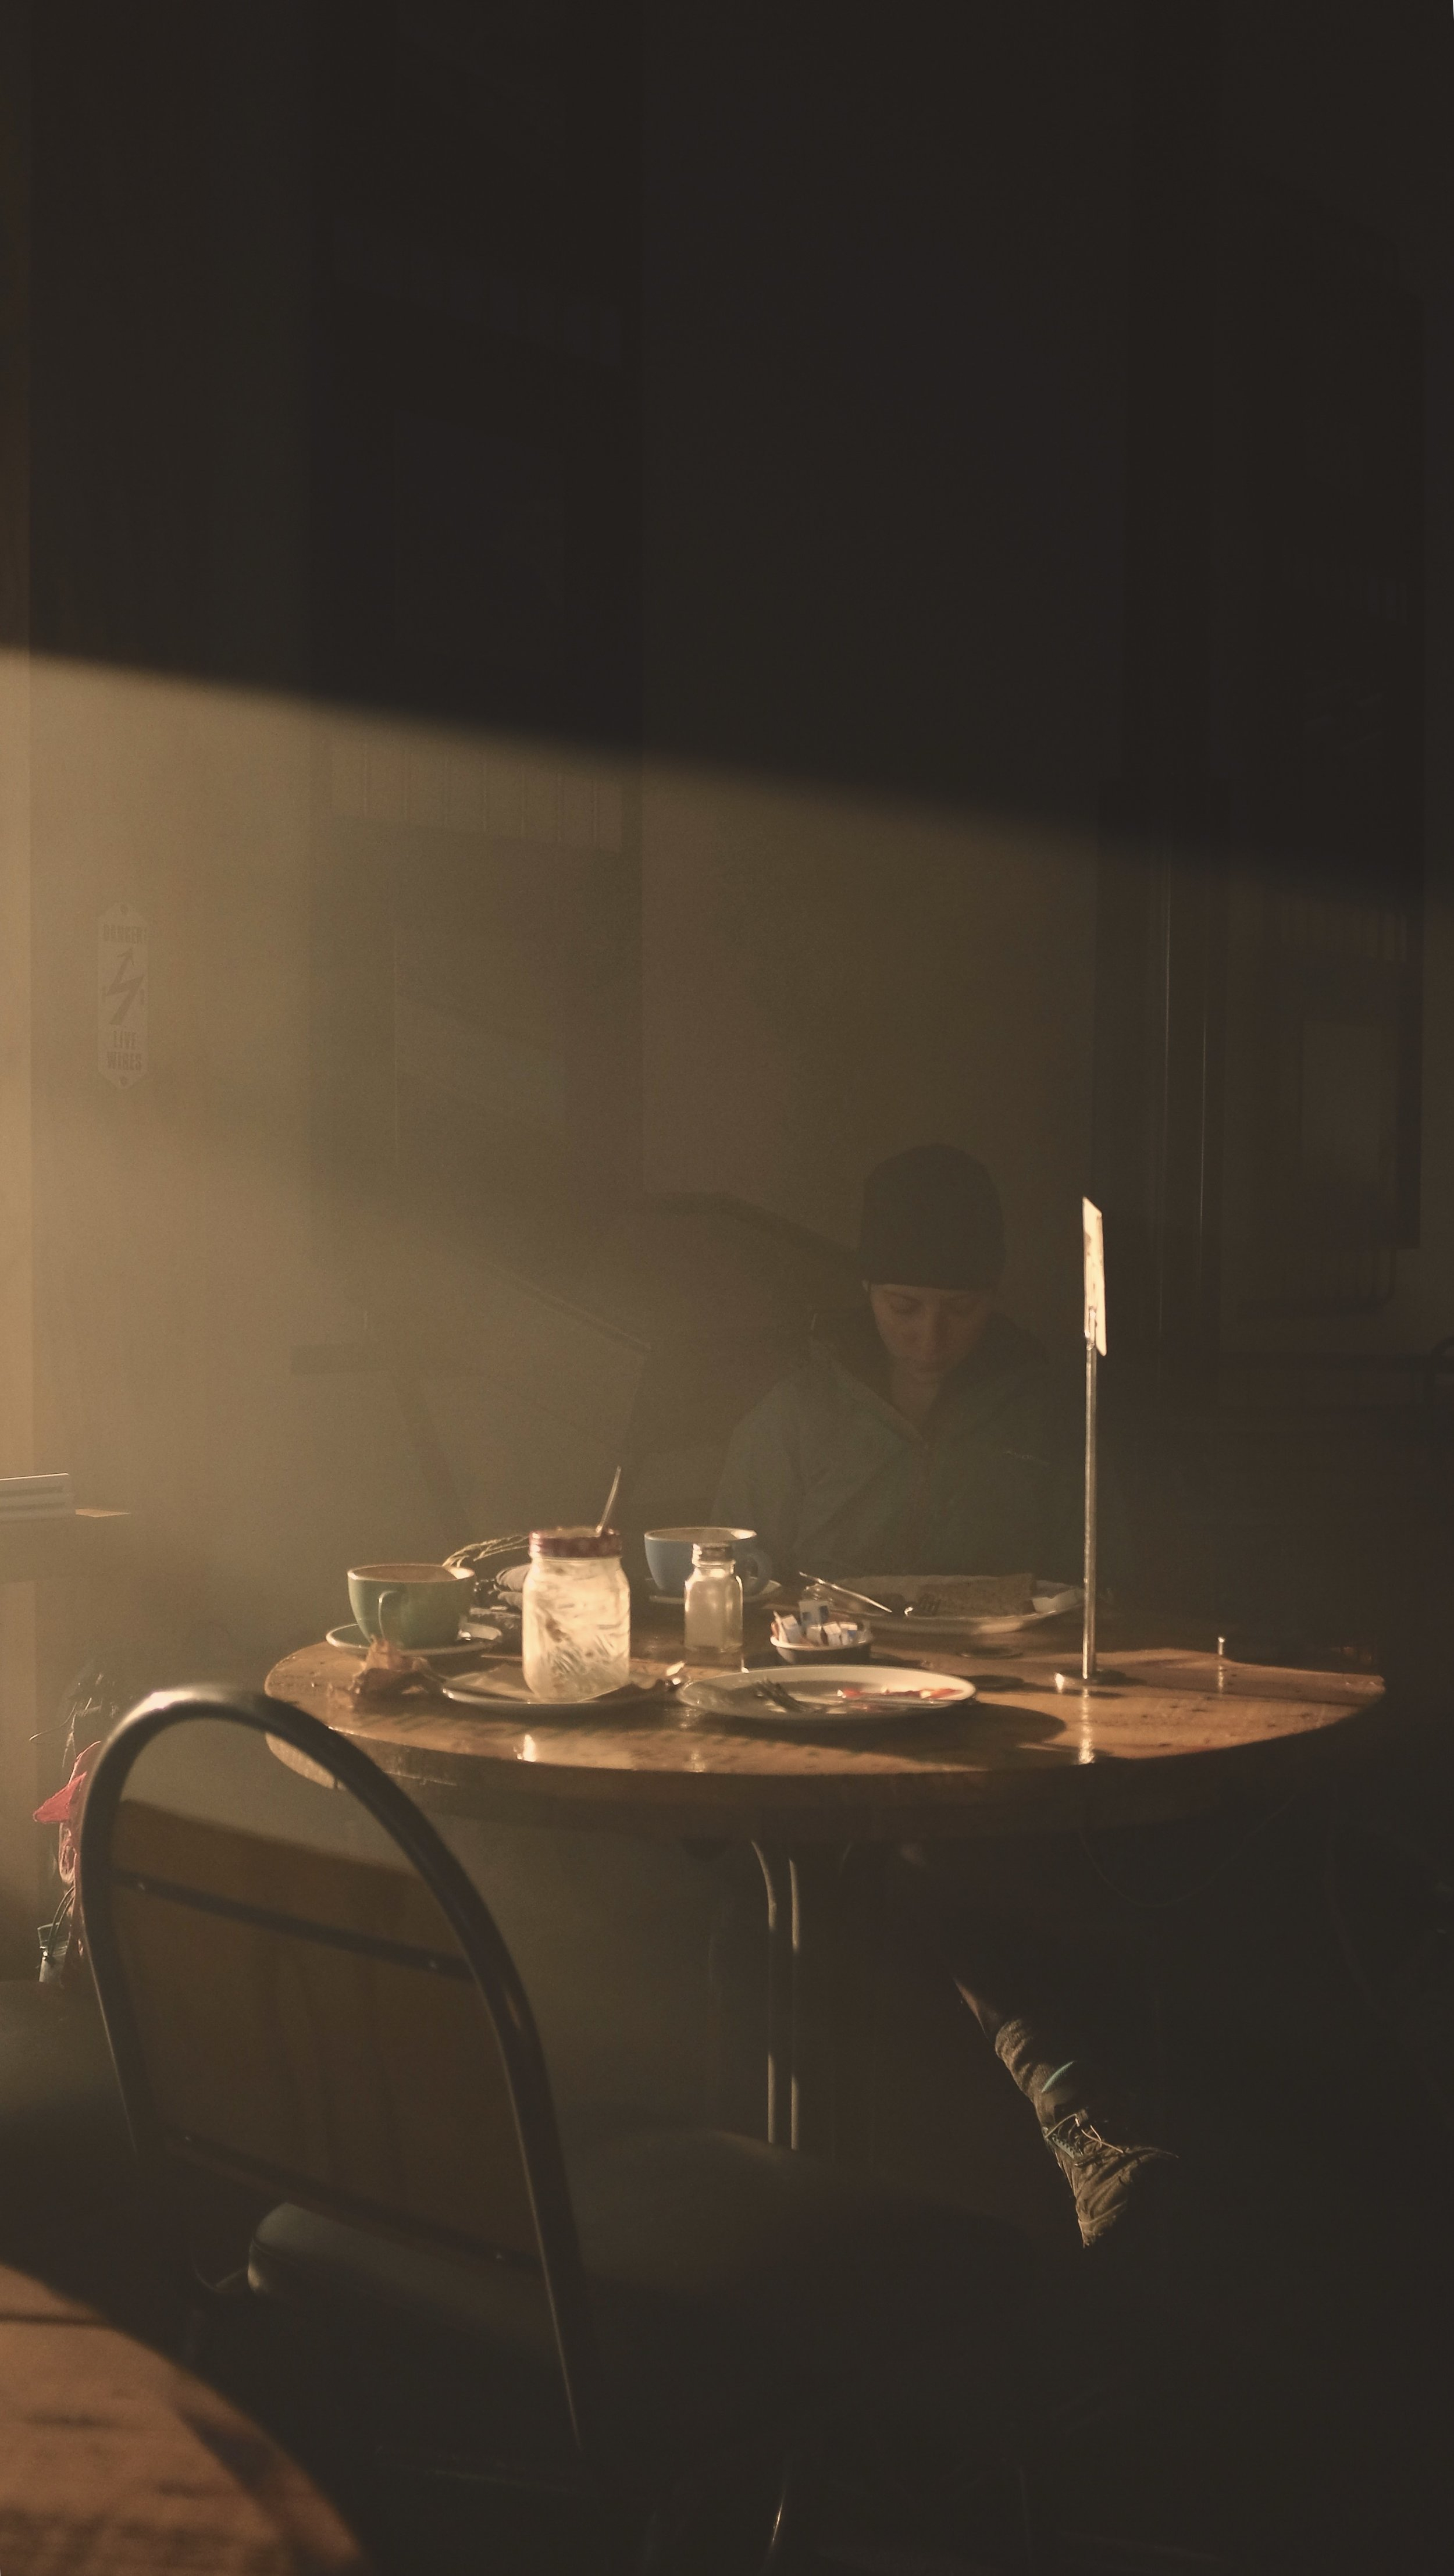 Early morning cafe in Twizel.